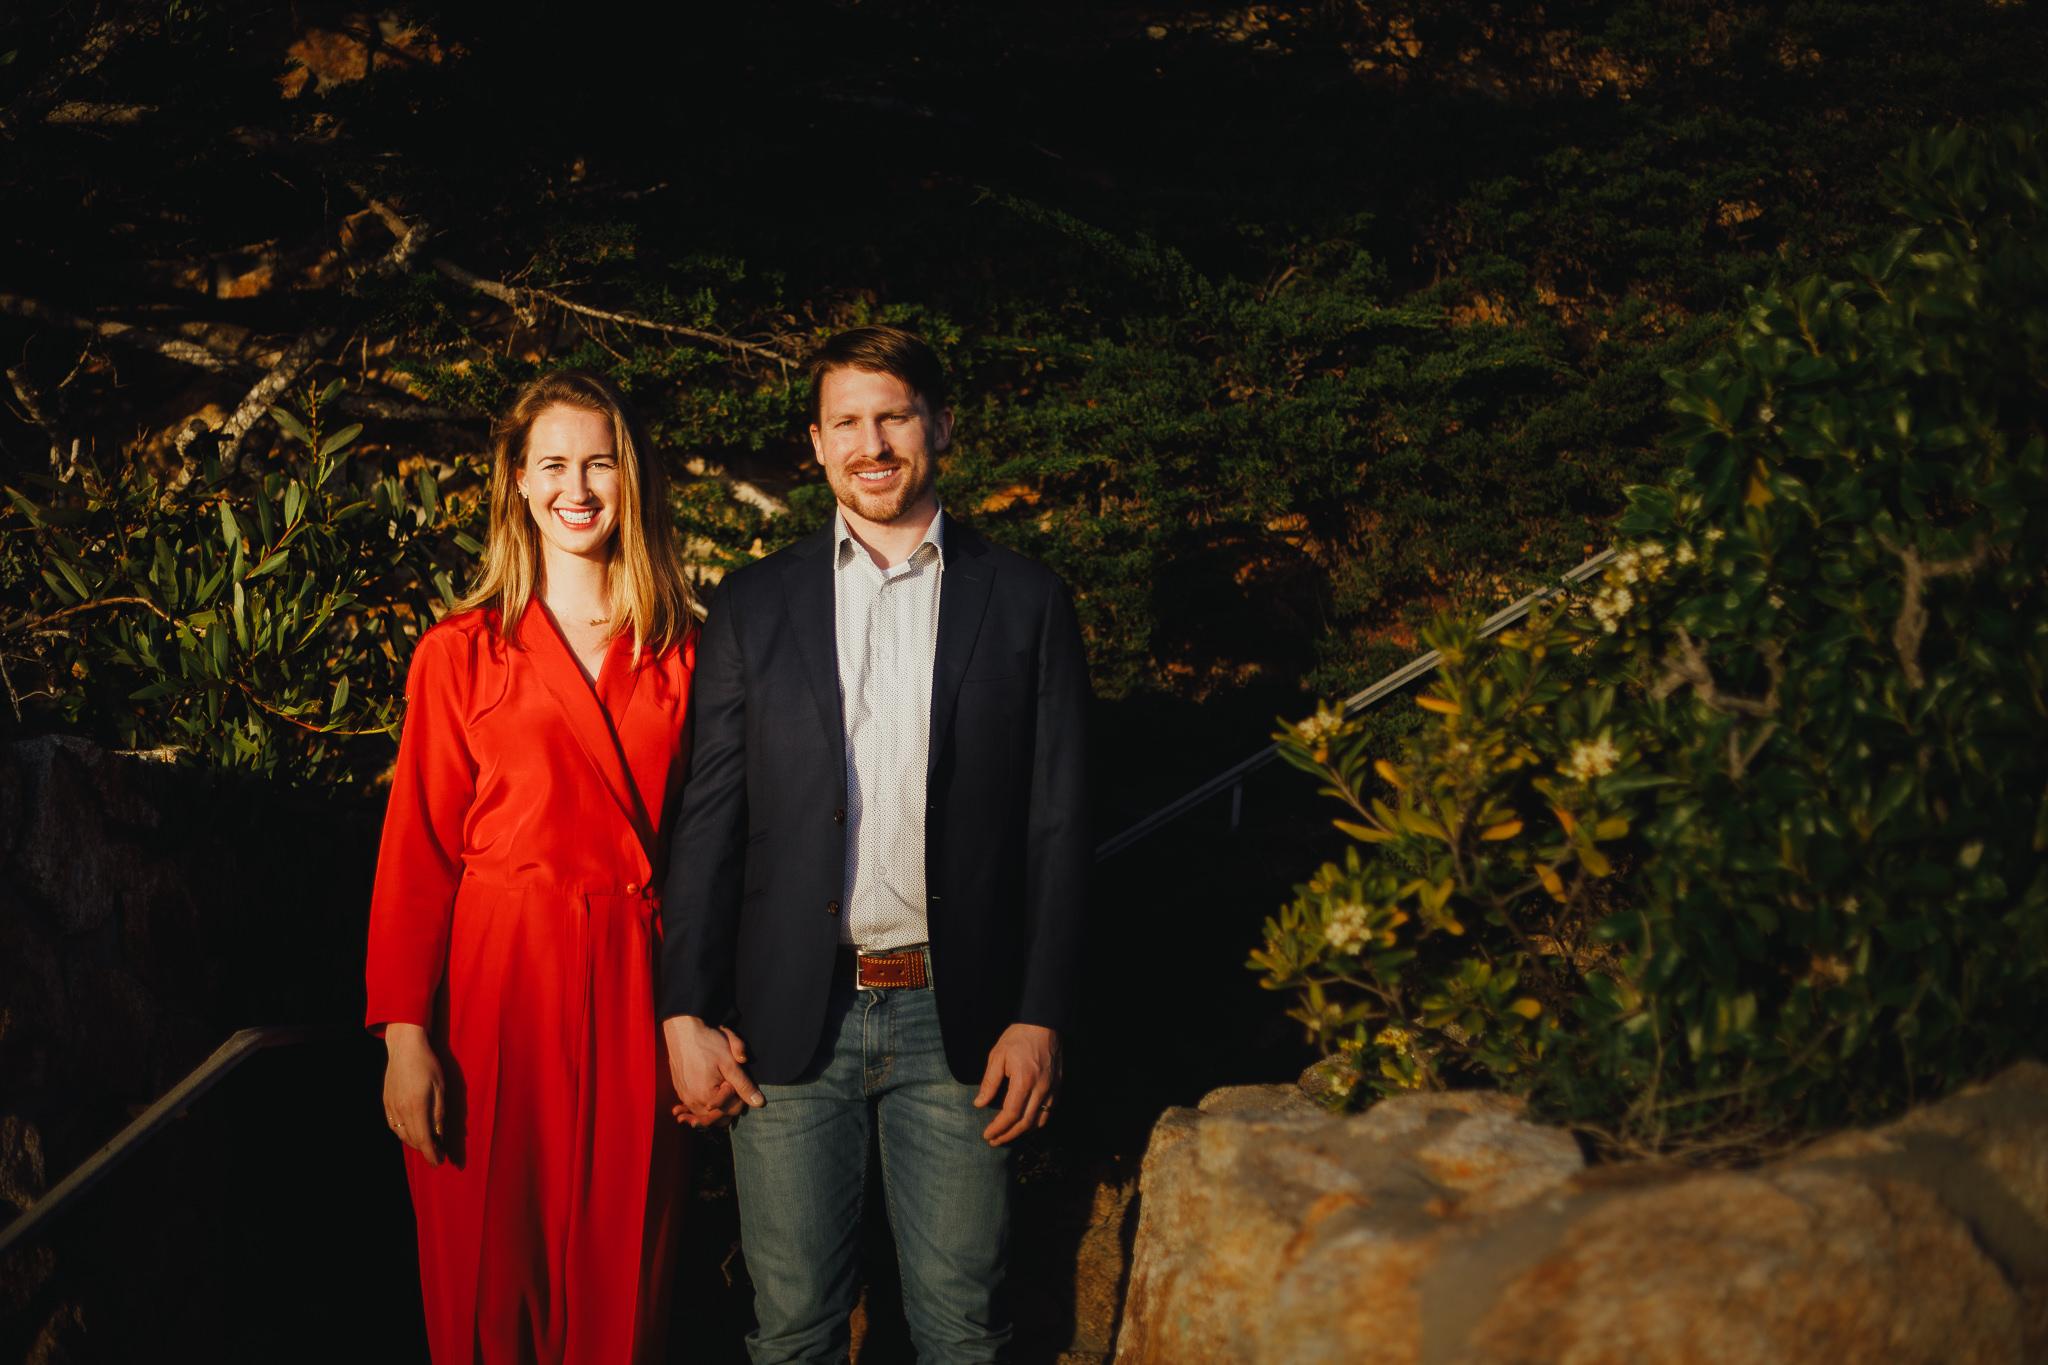 Archer Inspired Photography Carmel Beach California Wedding Engagement Lifestyle Anniversary Natural Light Photographer-14.jpg